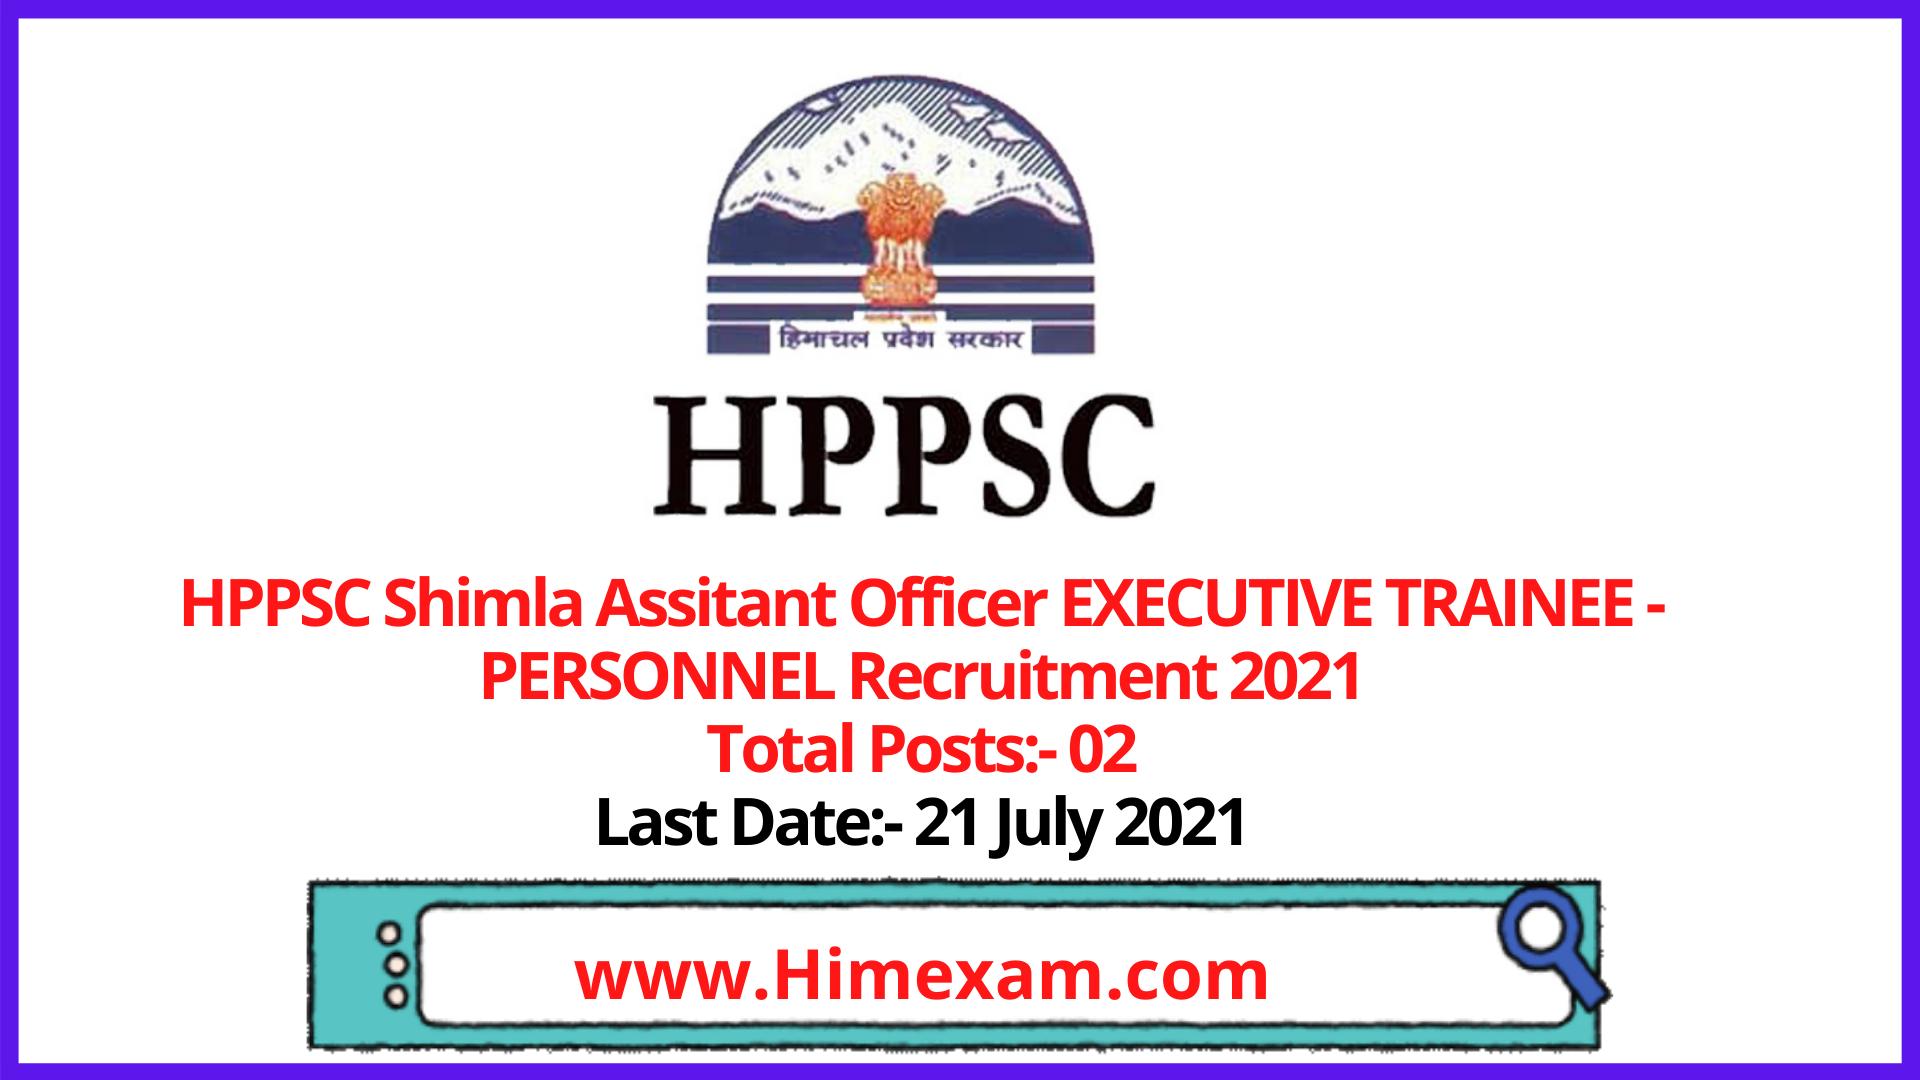 HPPSC Shimla  Assitant Officer EXECUTIVE TRAINEE - PERSONNEL Recruitment 2021